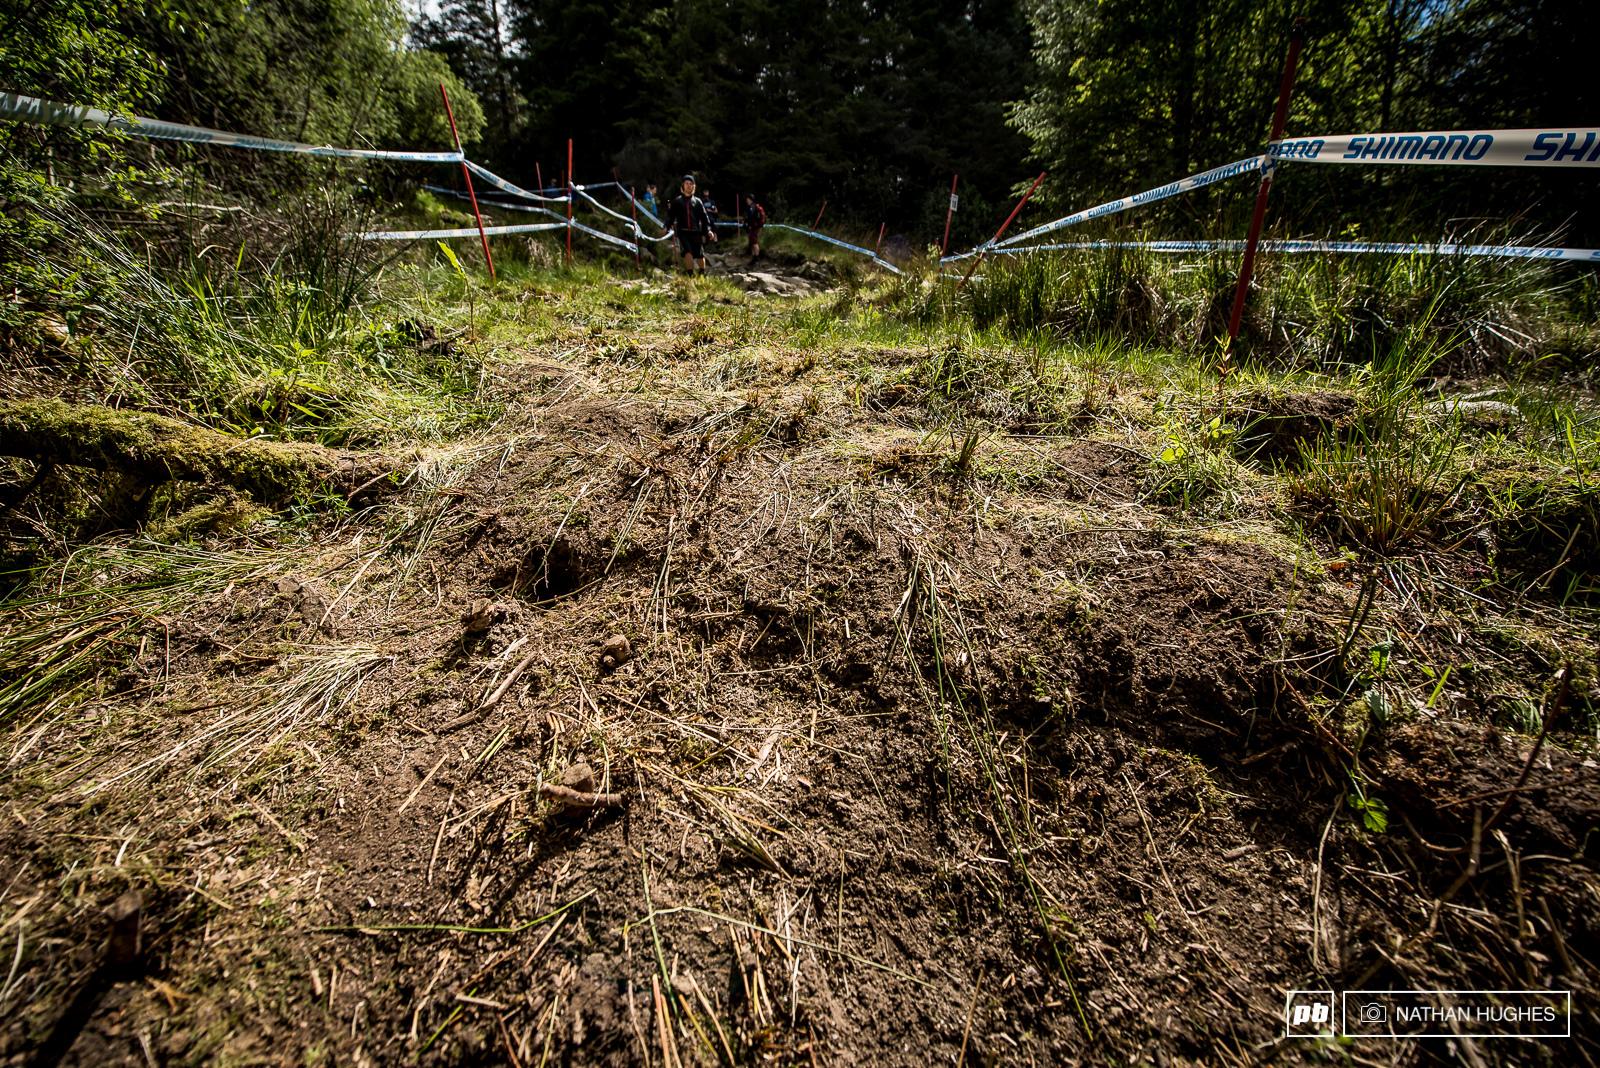 Goodbye horrific axle-deep bog hello grassy bank into a brand new woods diversion.